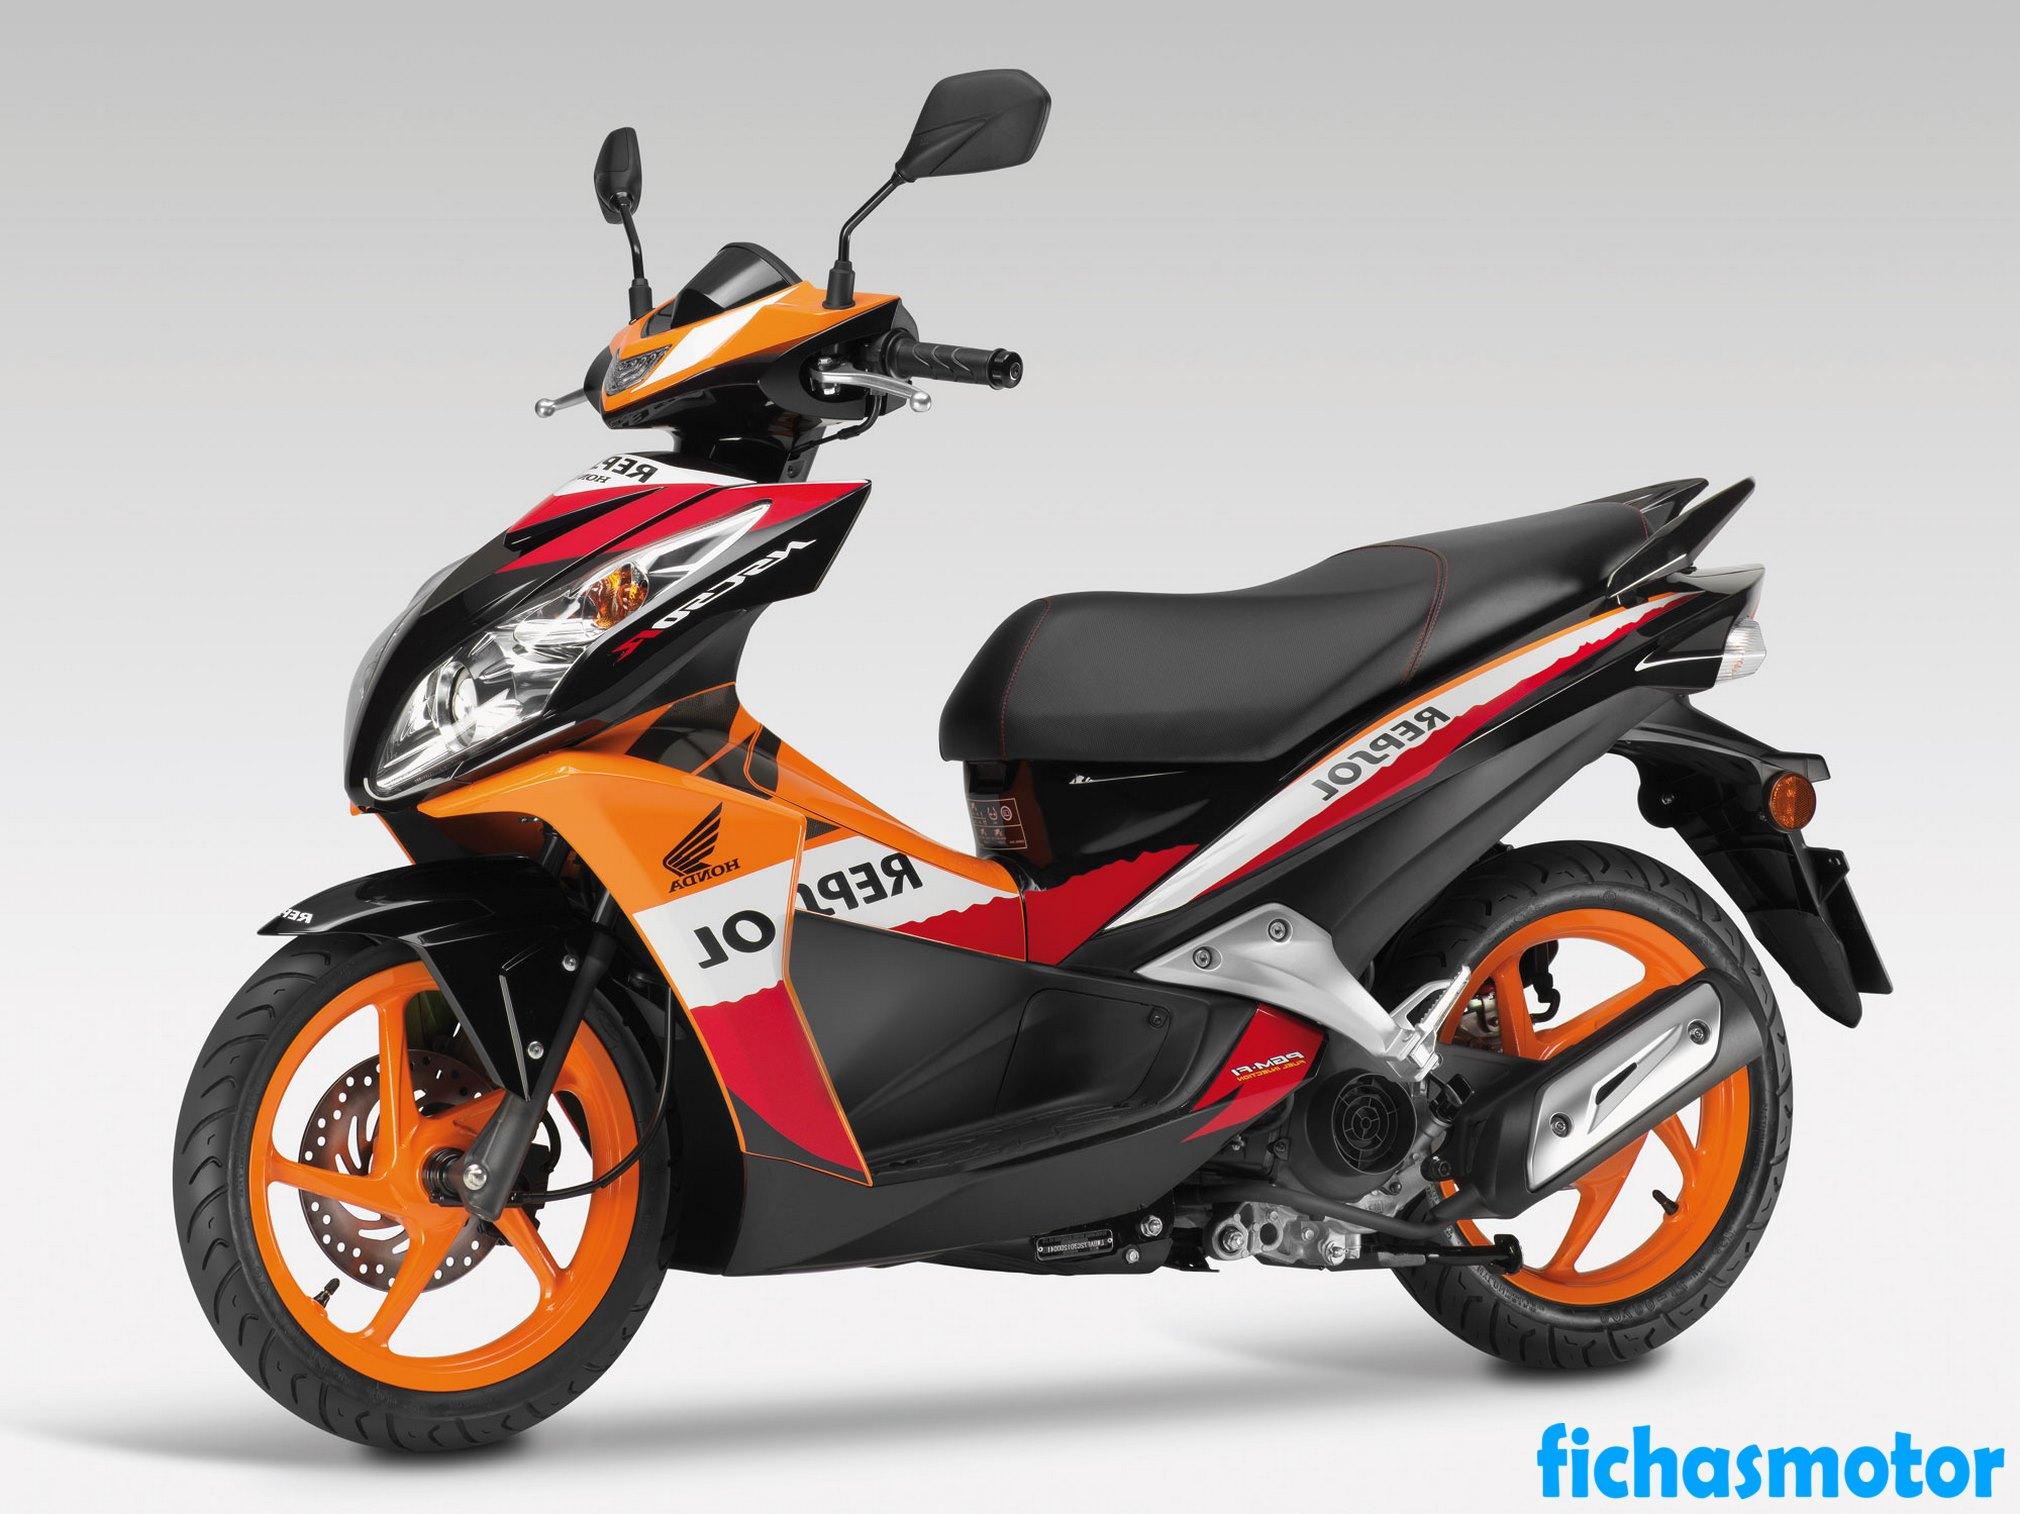 Imagen moto Honda nsc50r año 2013